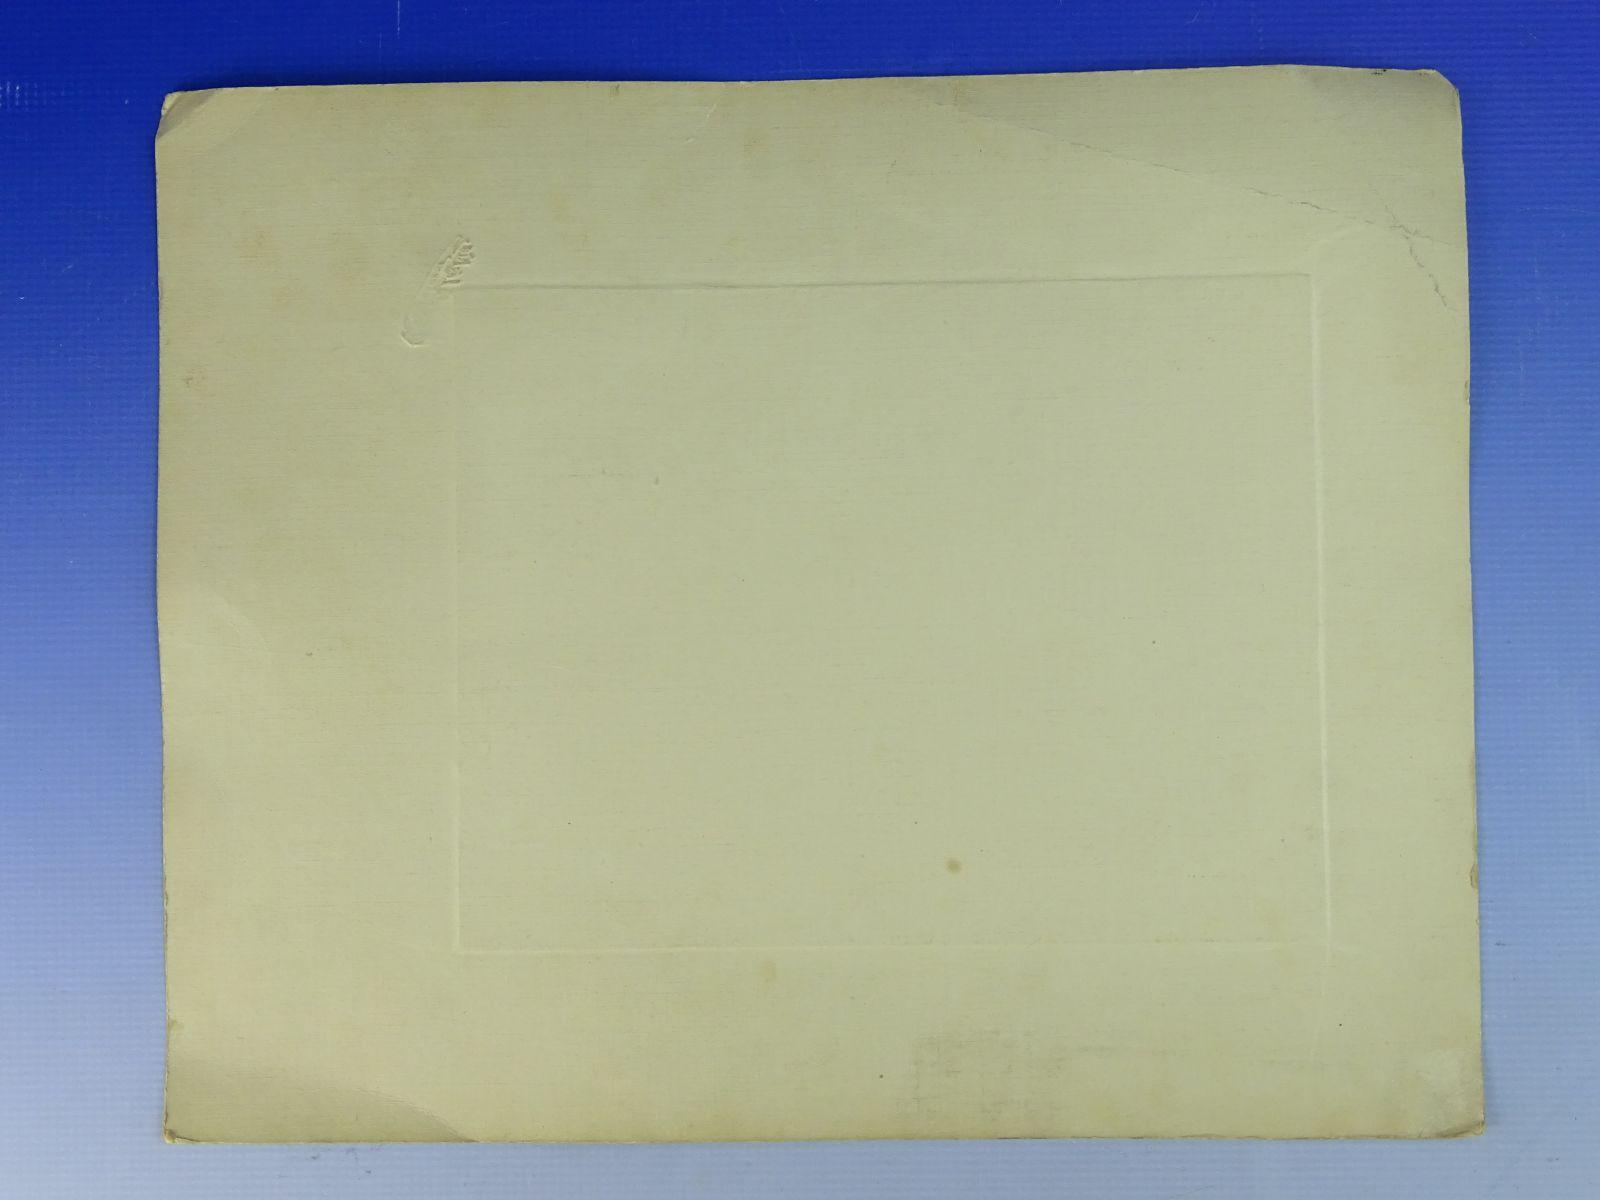 DSC00771.JPG (1600×1200)